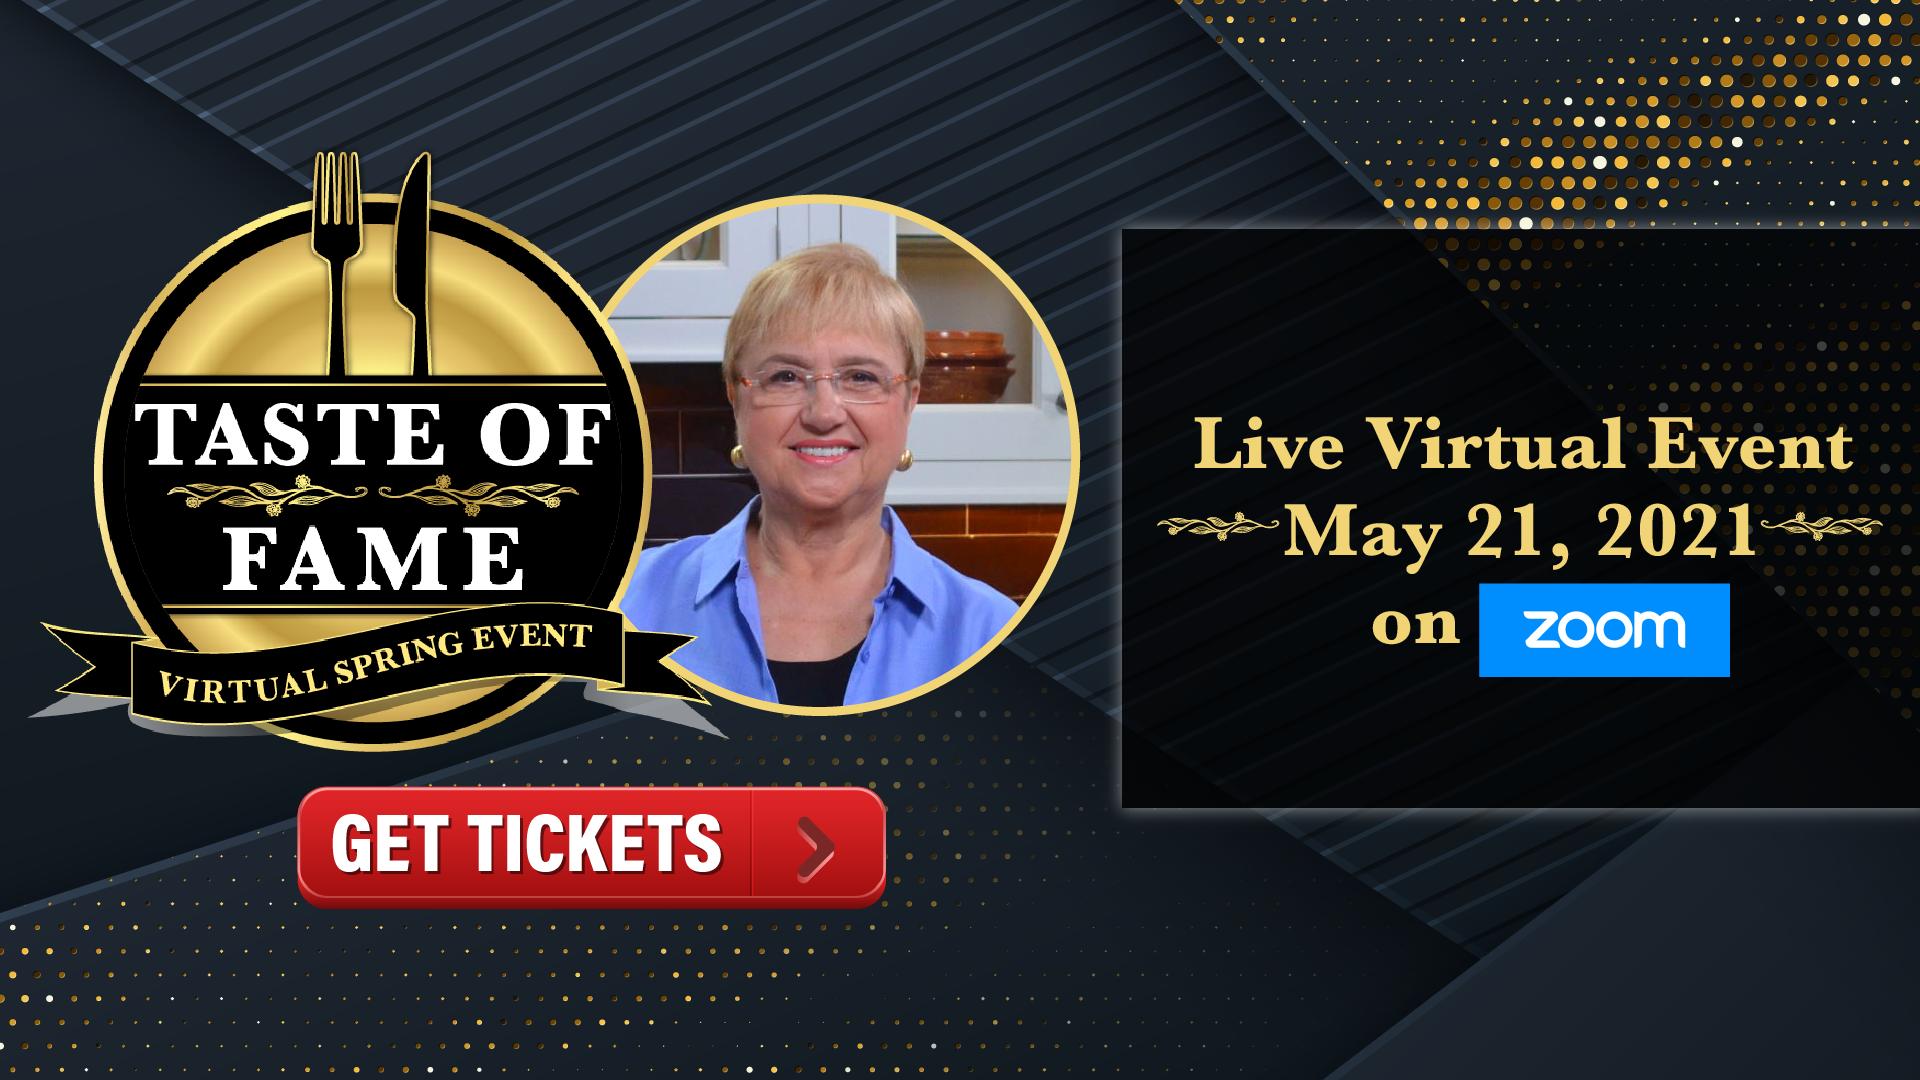 Taste of Fame Virtual Event Image